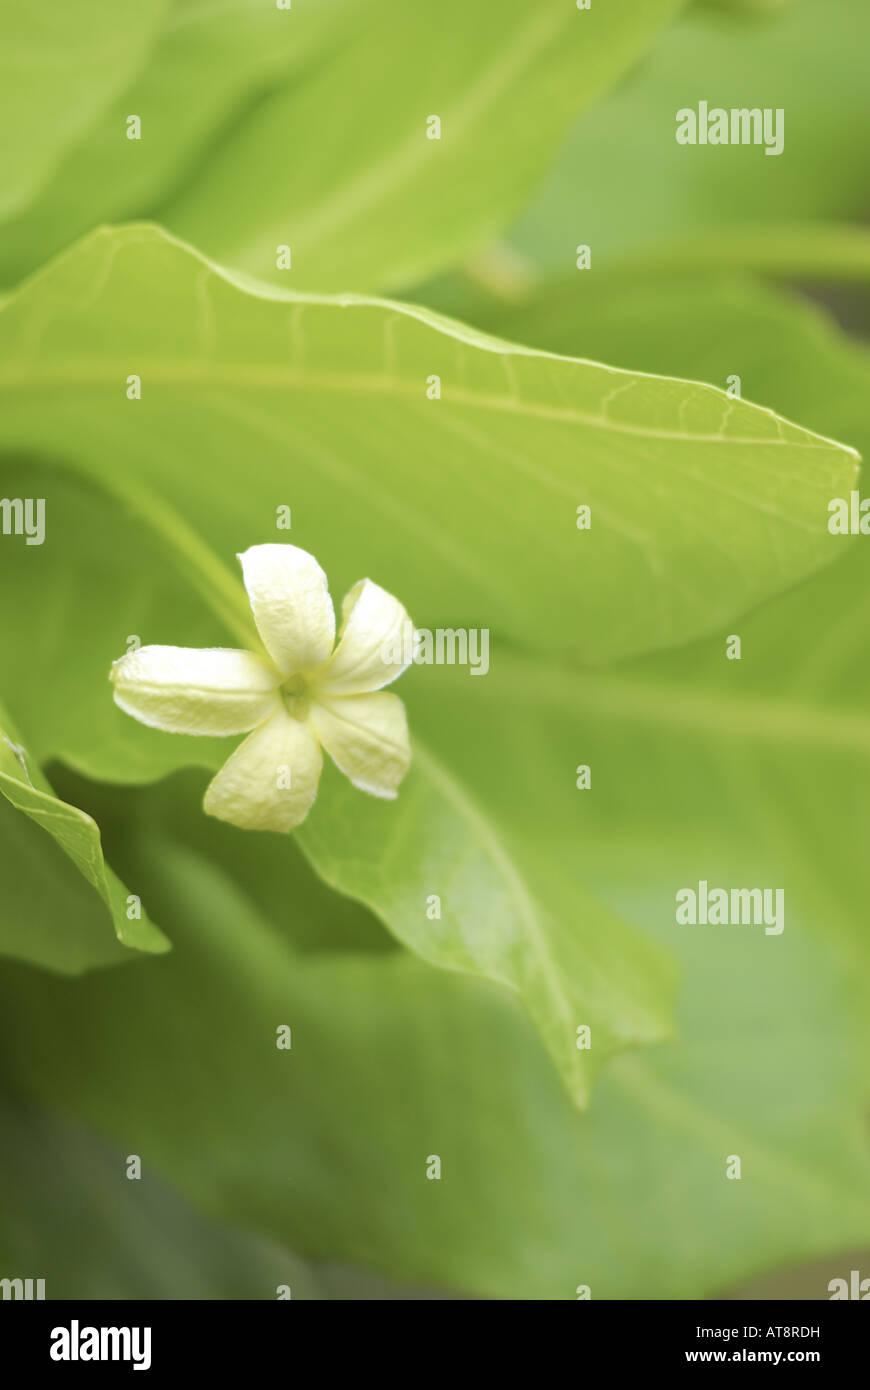 Rare endangered native hawaiian alula plant scientific name rare endangered native hawaiian alula plant scientific name brighamia insignis with delicate white star shaped flowers izmirmasajfo